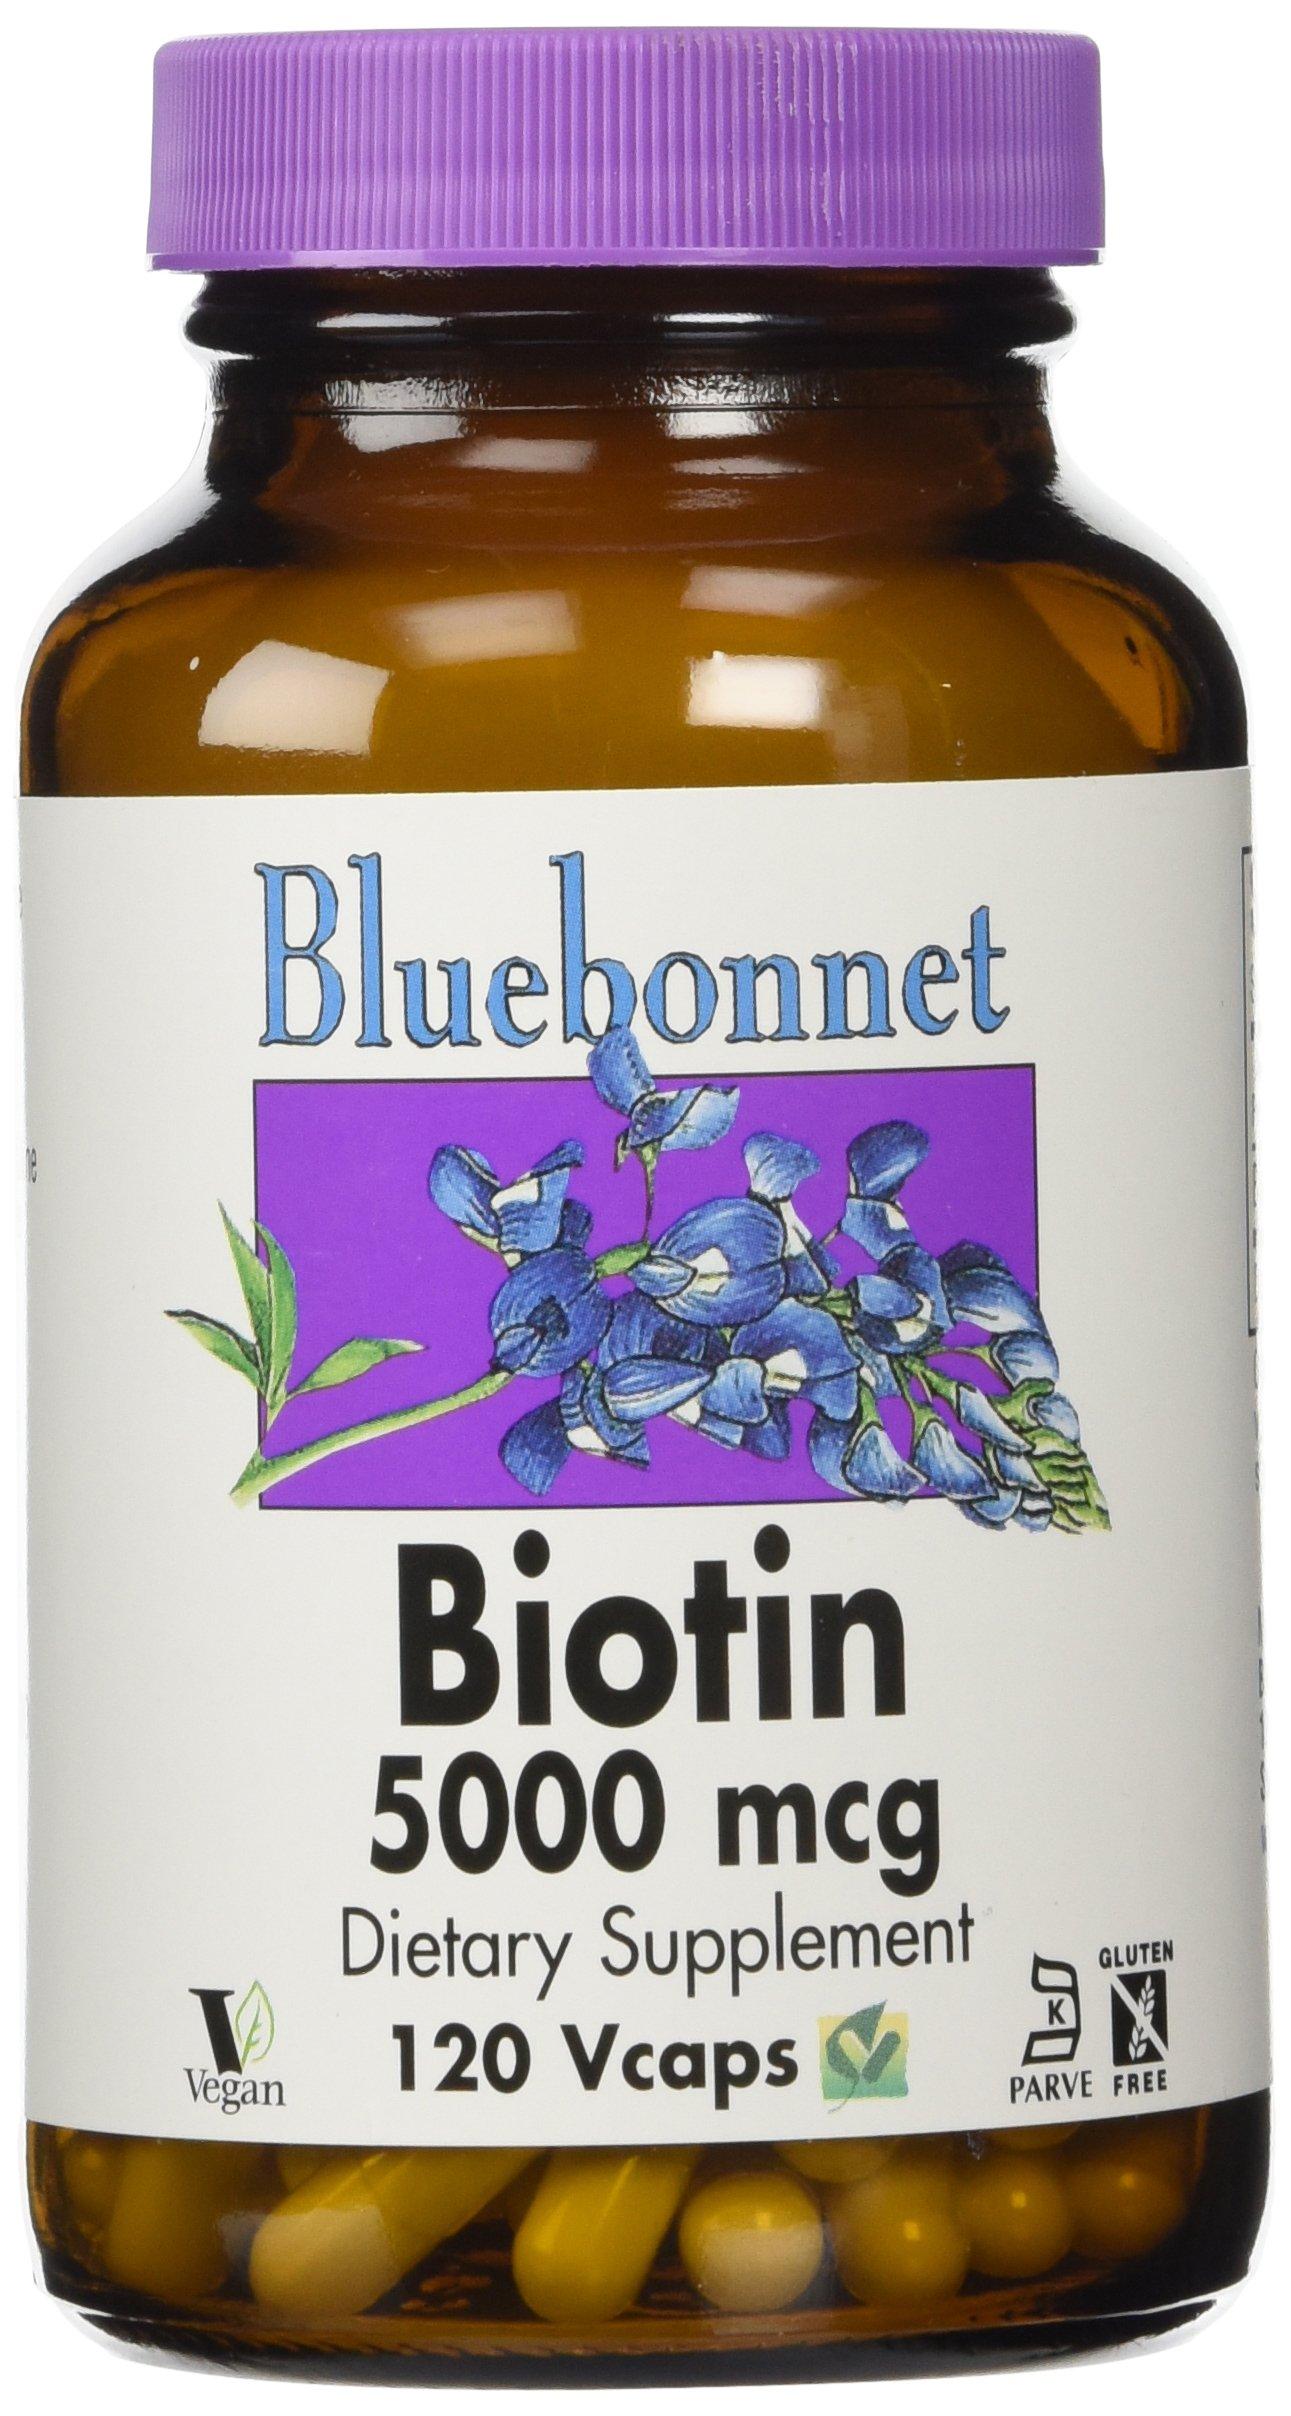 Bluebonnet Biotin 5000 mcg Vegetable Capsules, 120 Count